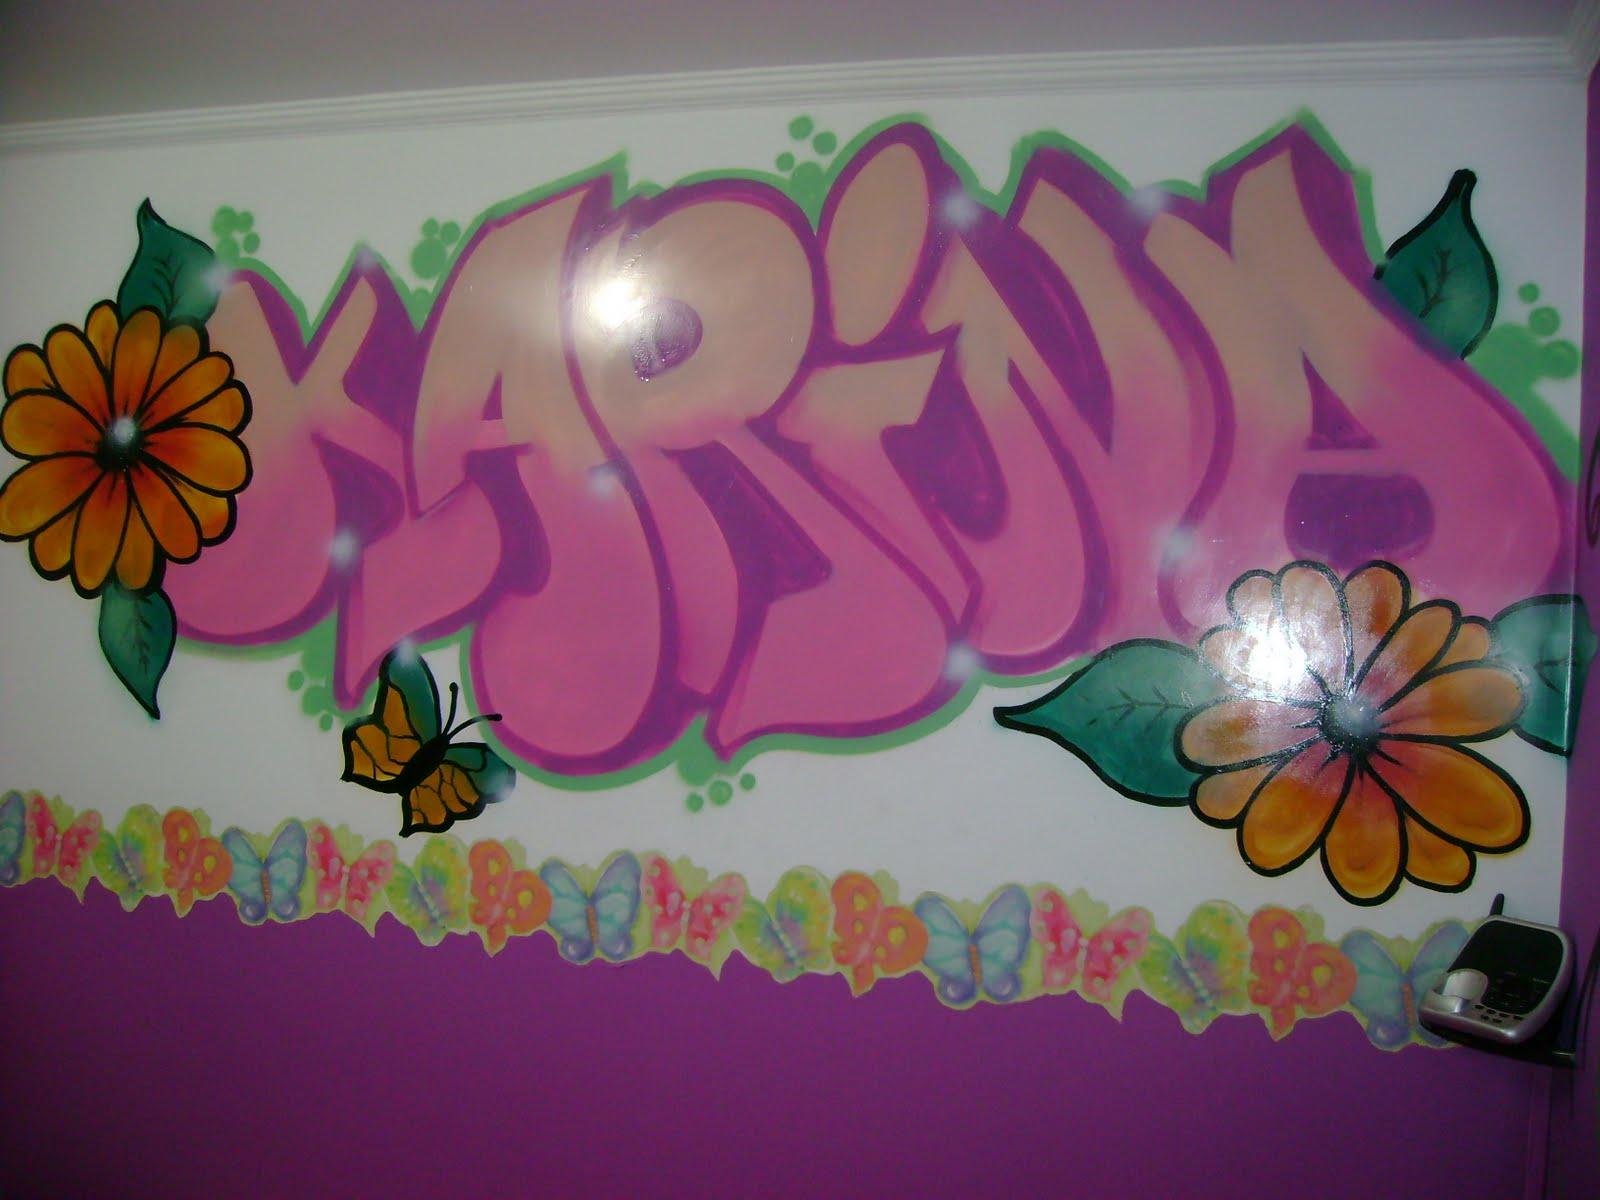 Karina Graffiti